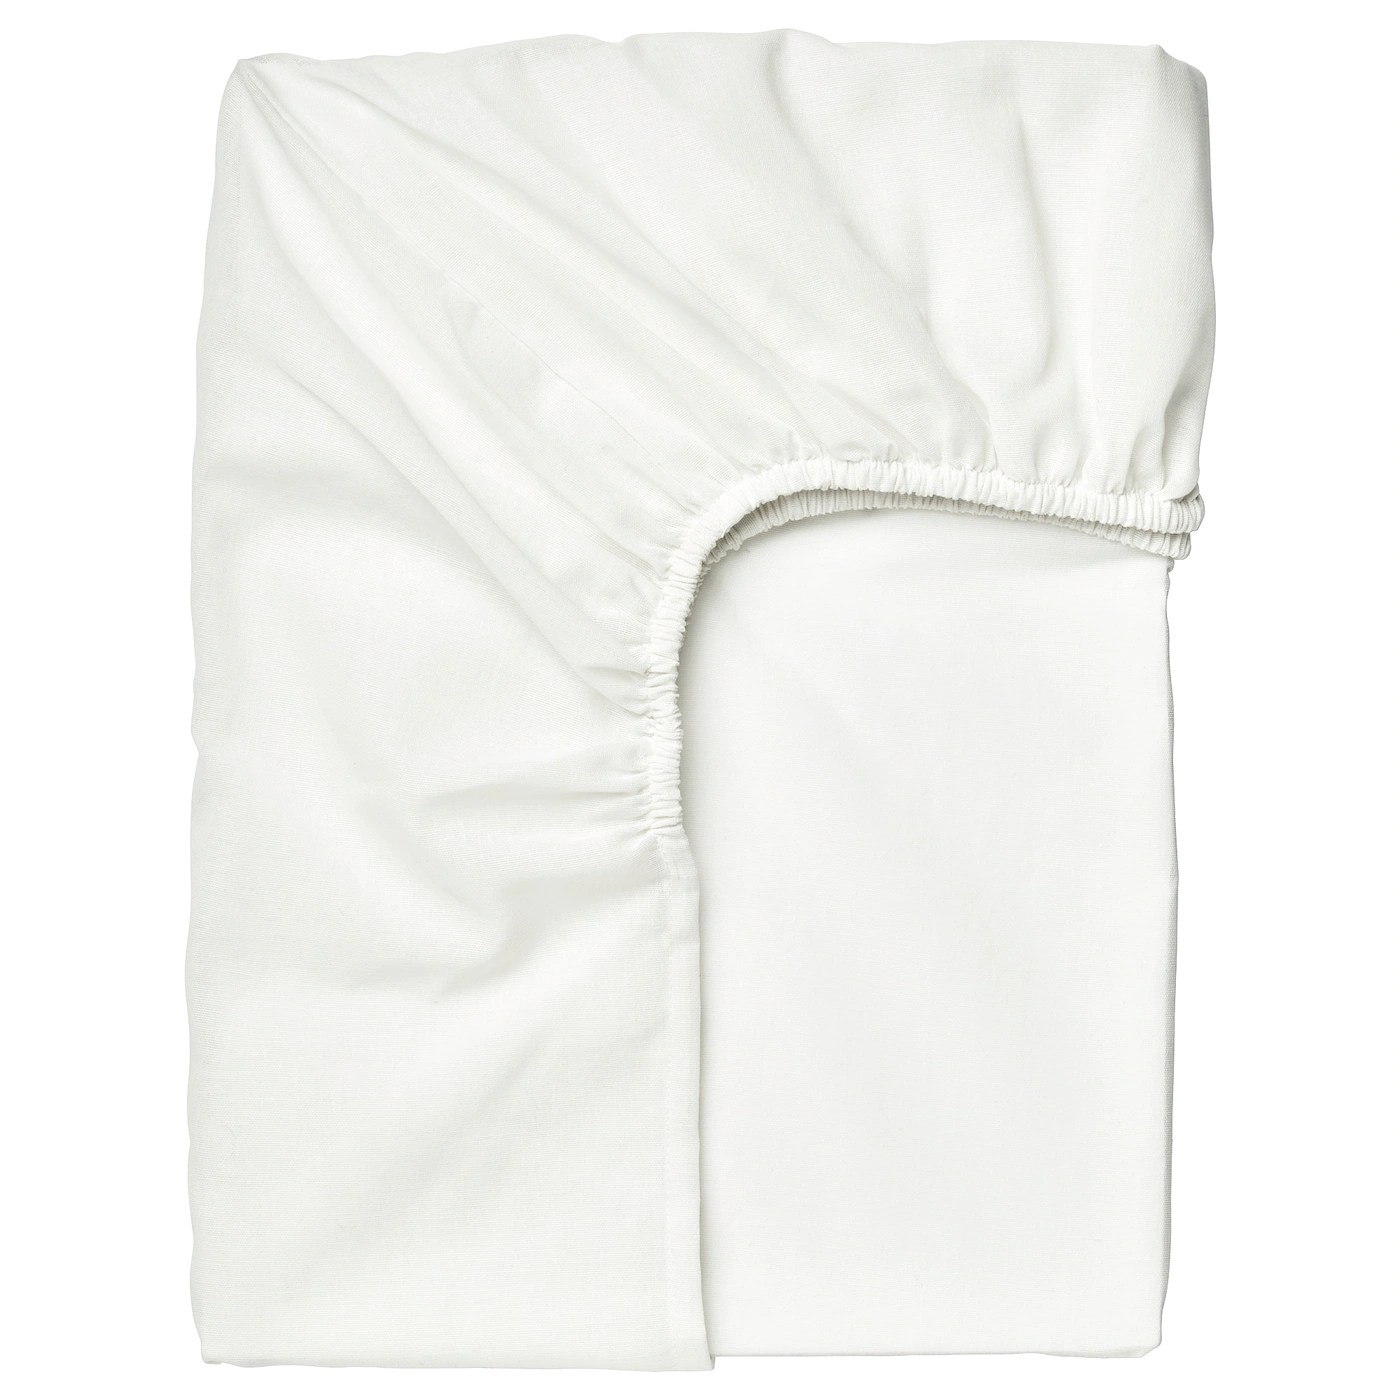 Taggvallmo Drap Housse Blanc 90x200 Cm Materiau Durable Ikea